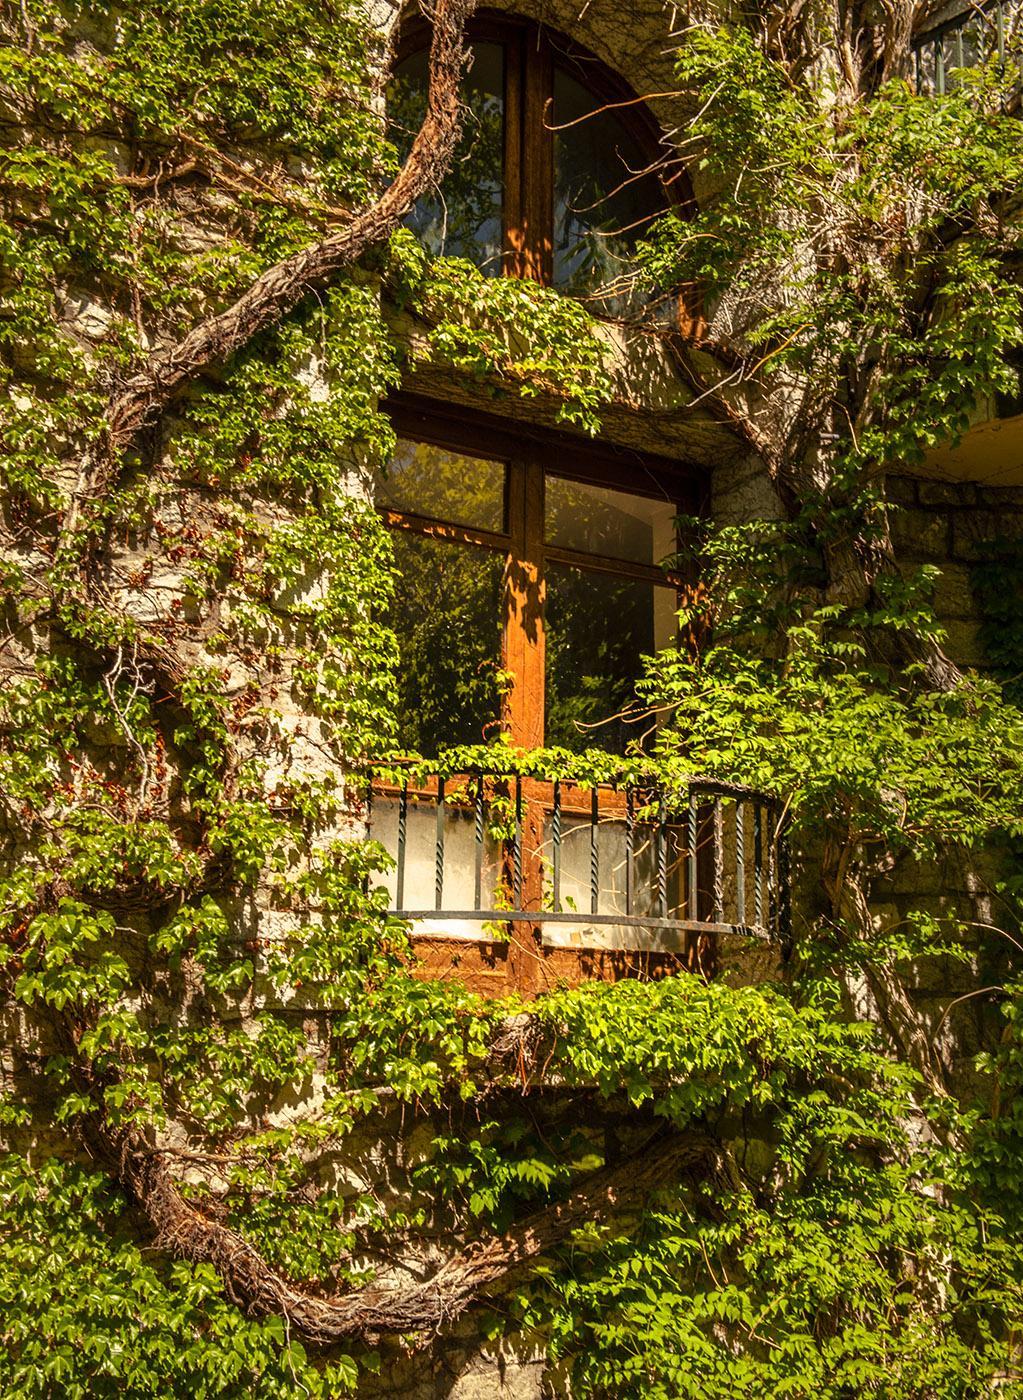 Völlig vom Efeu erobert: das Grand Hotel von Molitg-les-Bains. Foto: Hilke Maunder